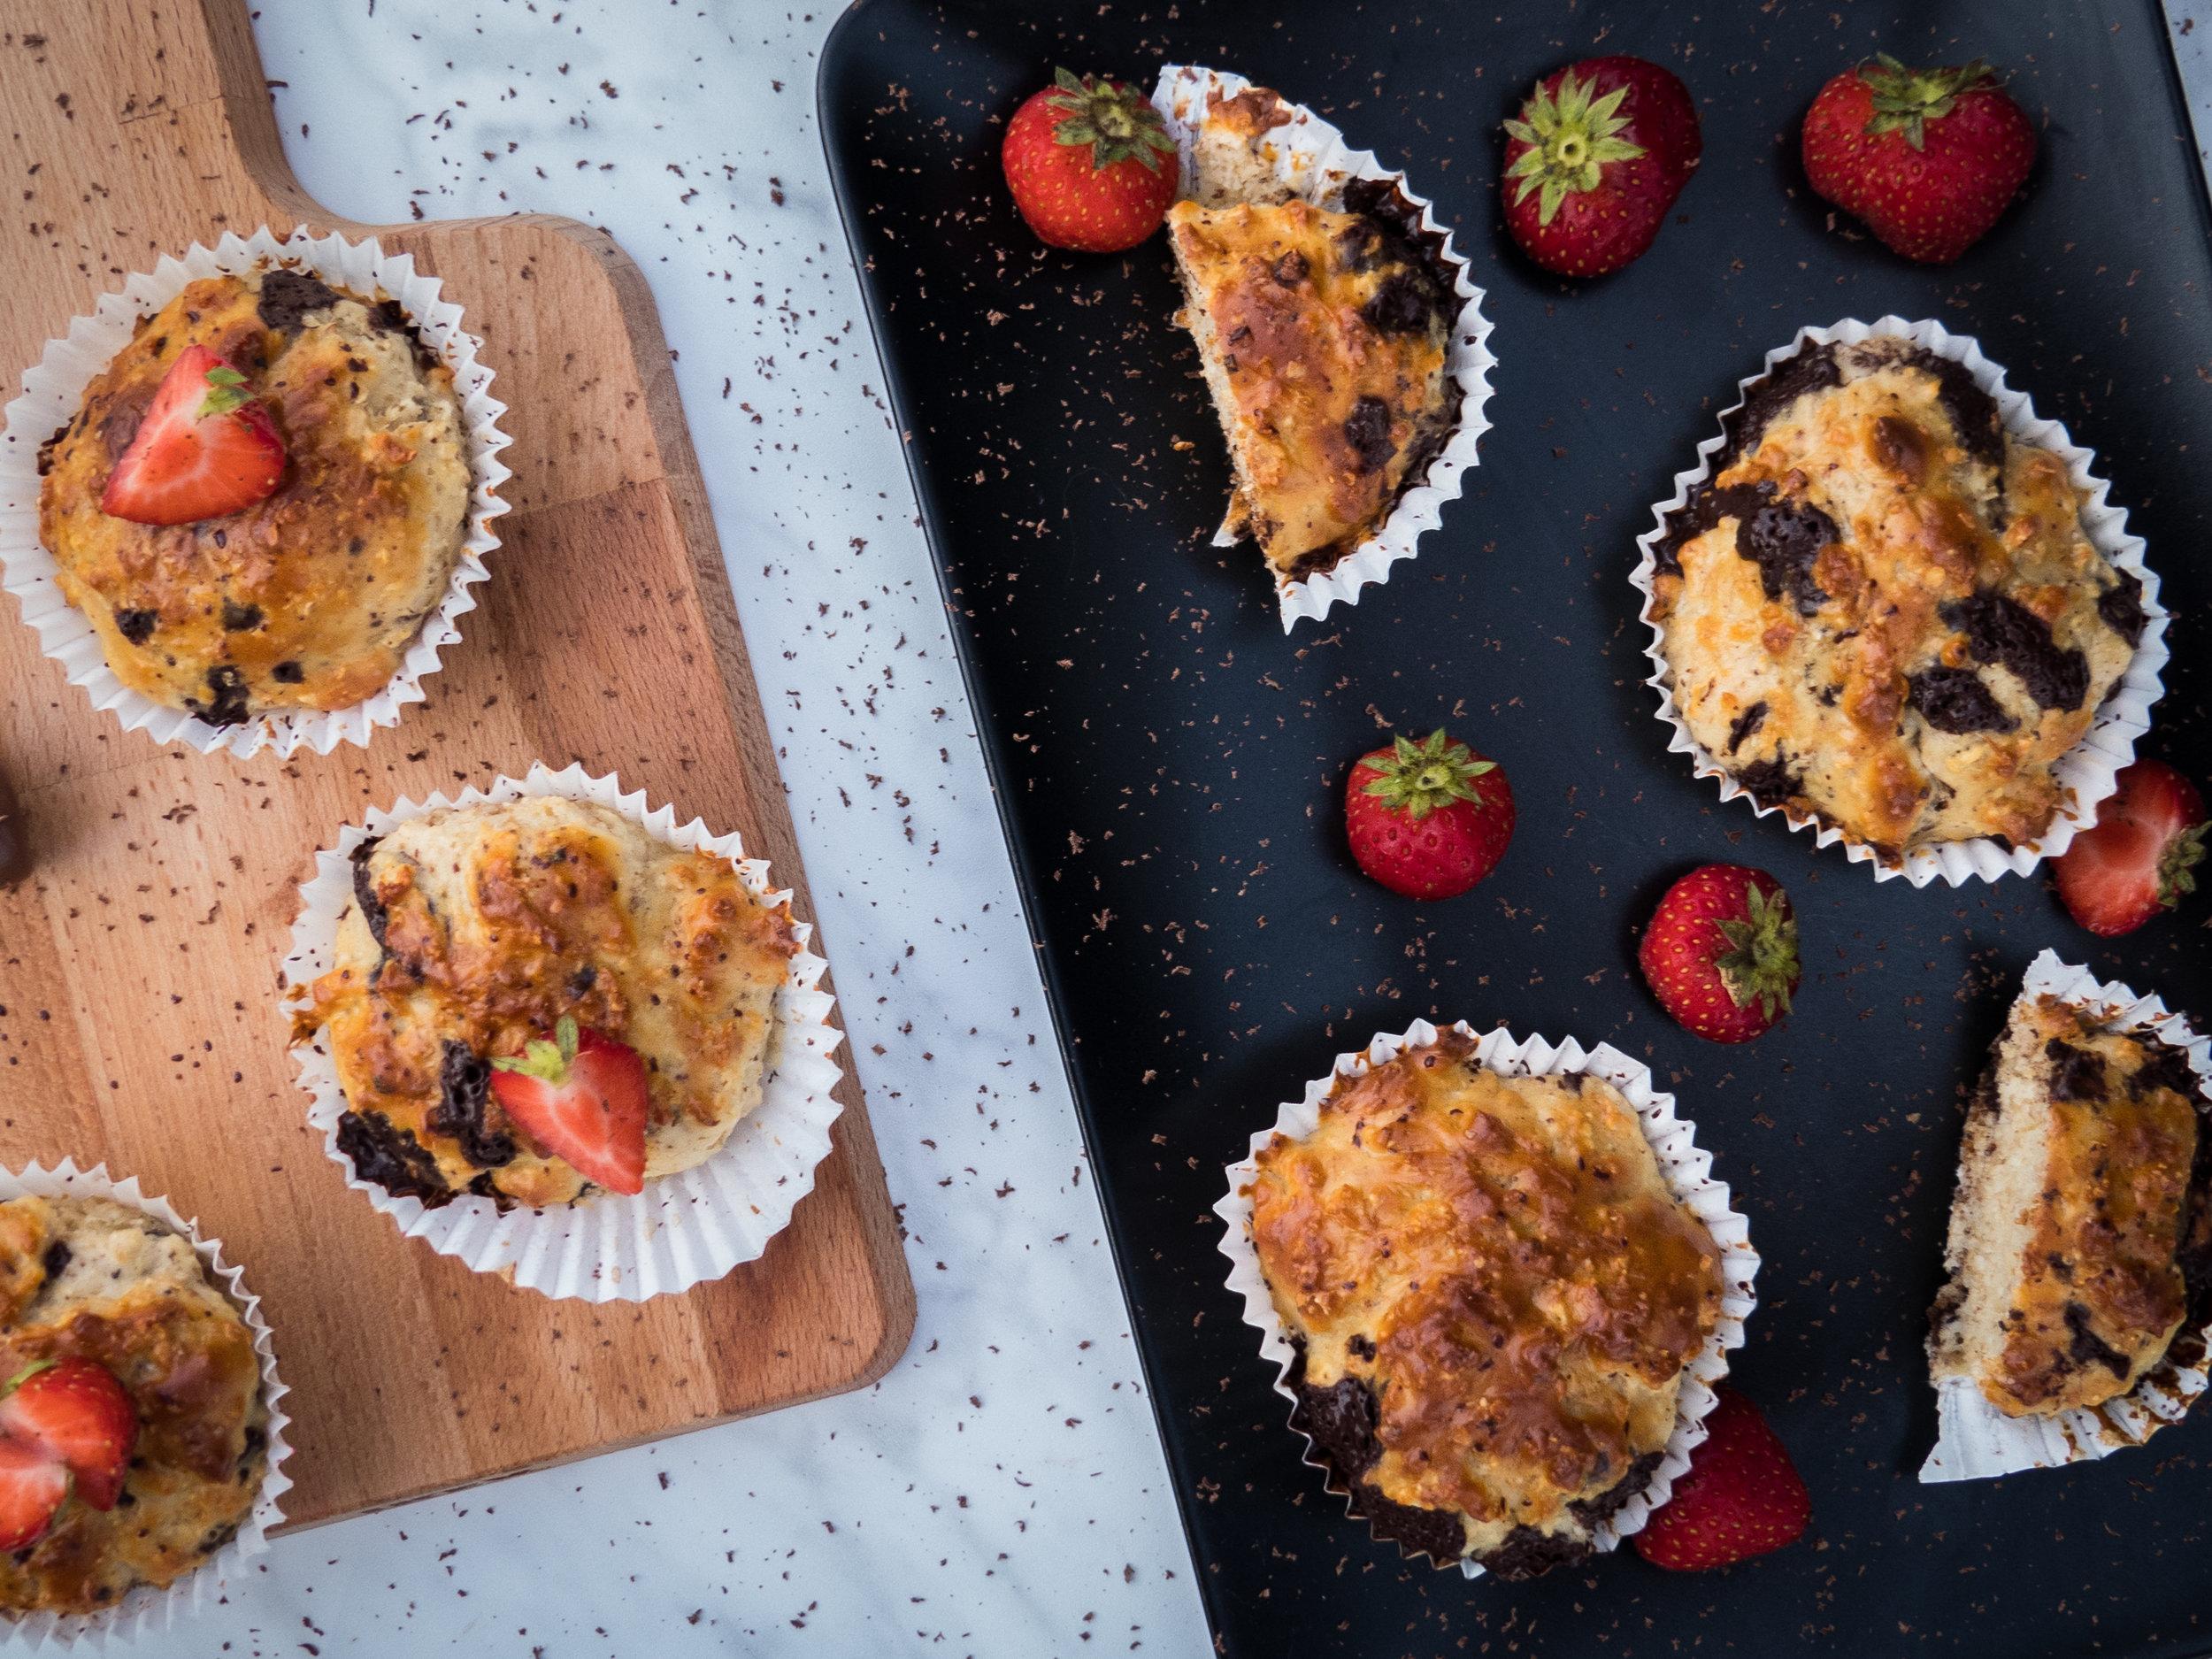 Vanilla, chocolate, coco and strawberry cupcakes5.jpg